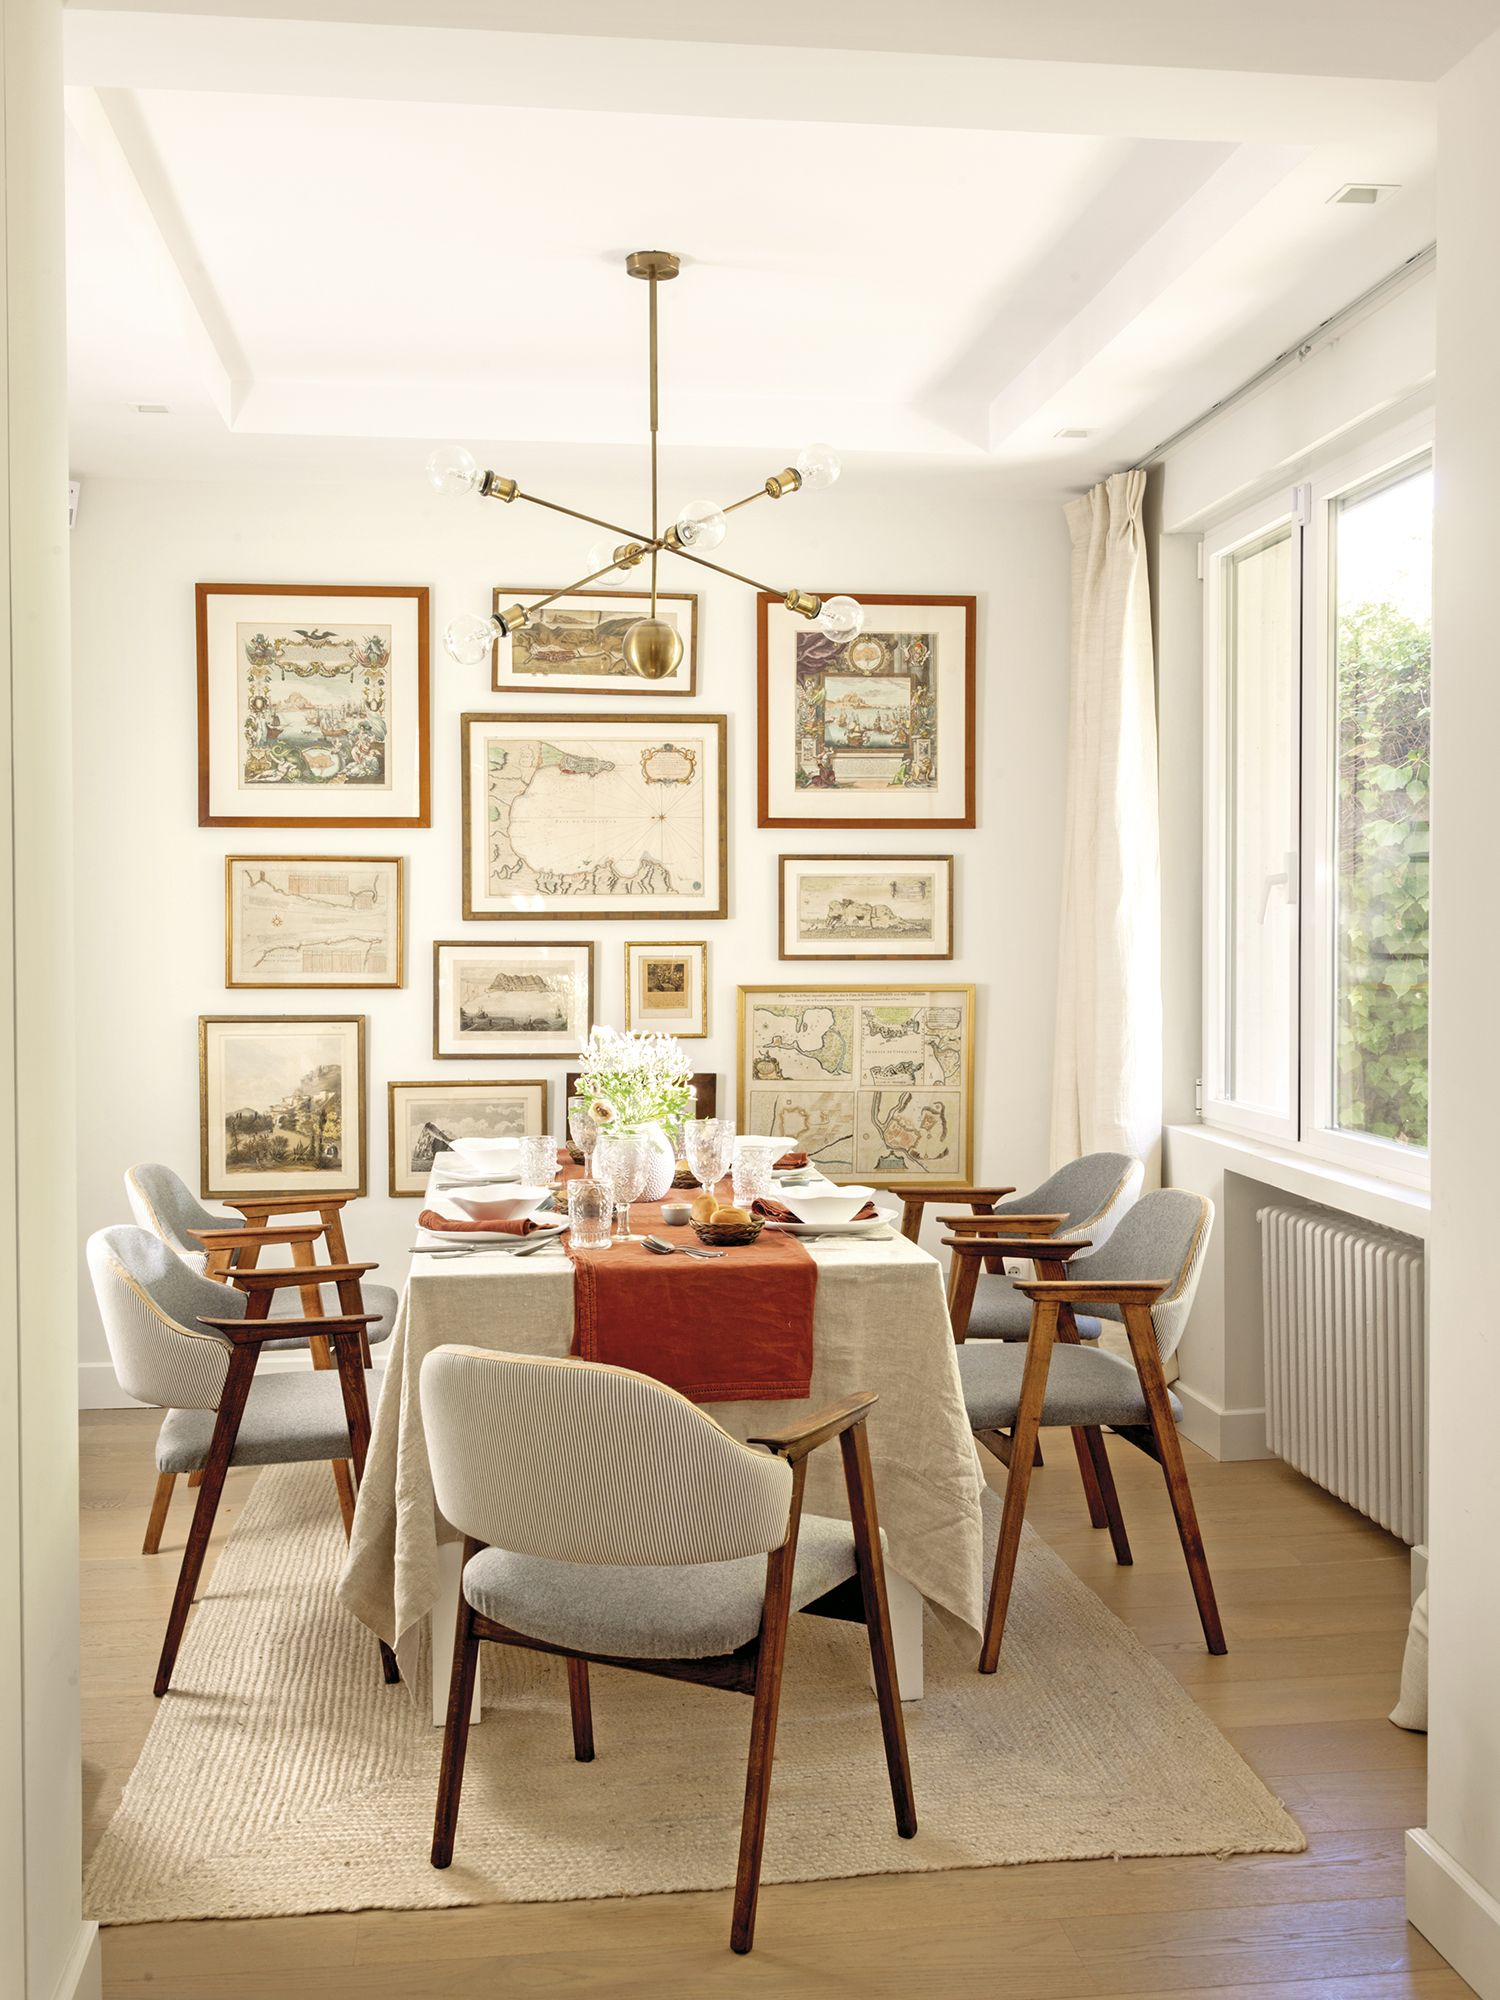 Pin by Dariusz Durlej on dining room   Pinterest   British colonial ...